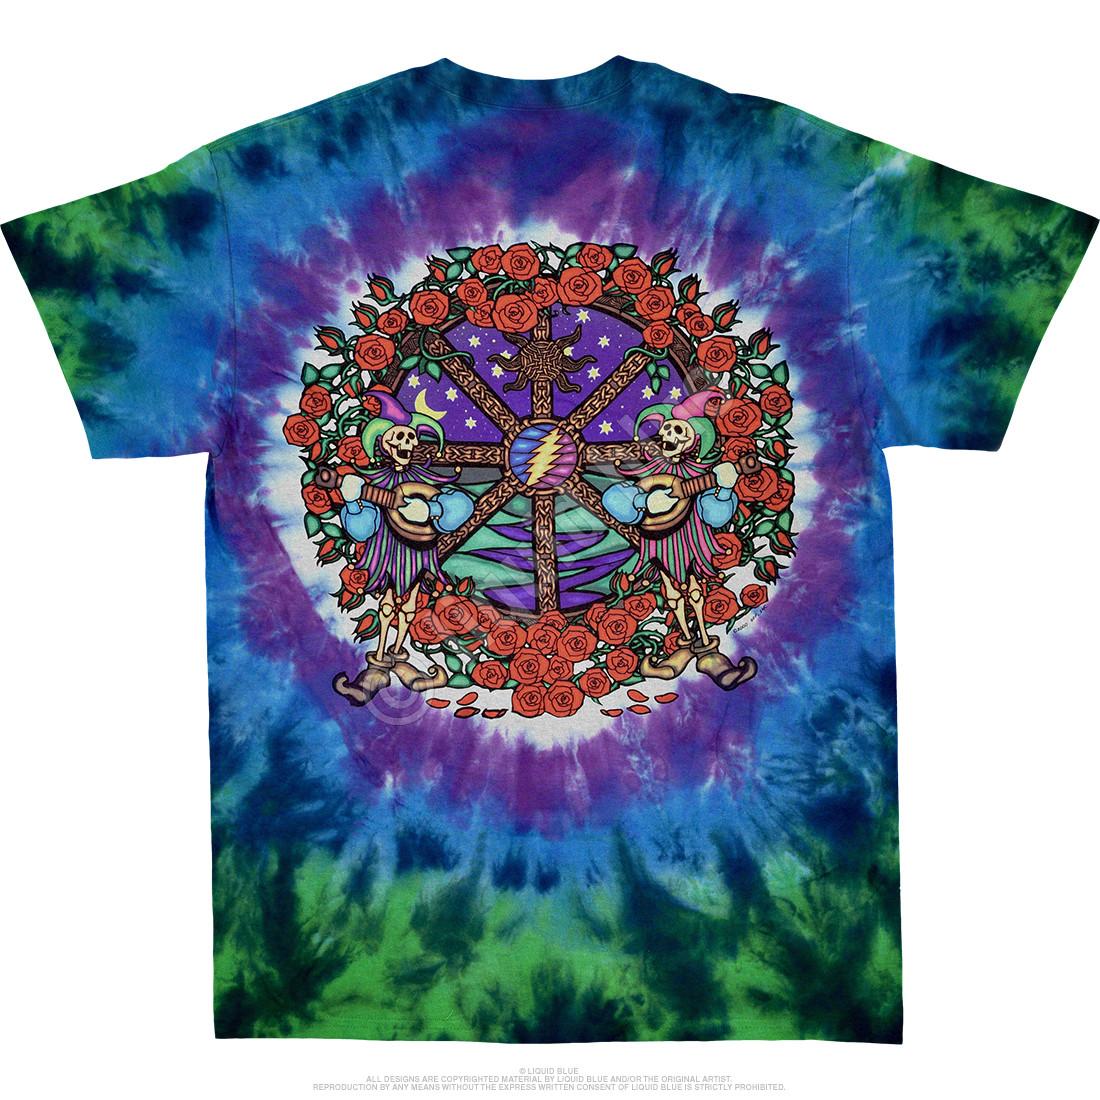 Celtic Mandala Tie-Dye T-Shirt